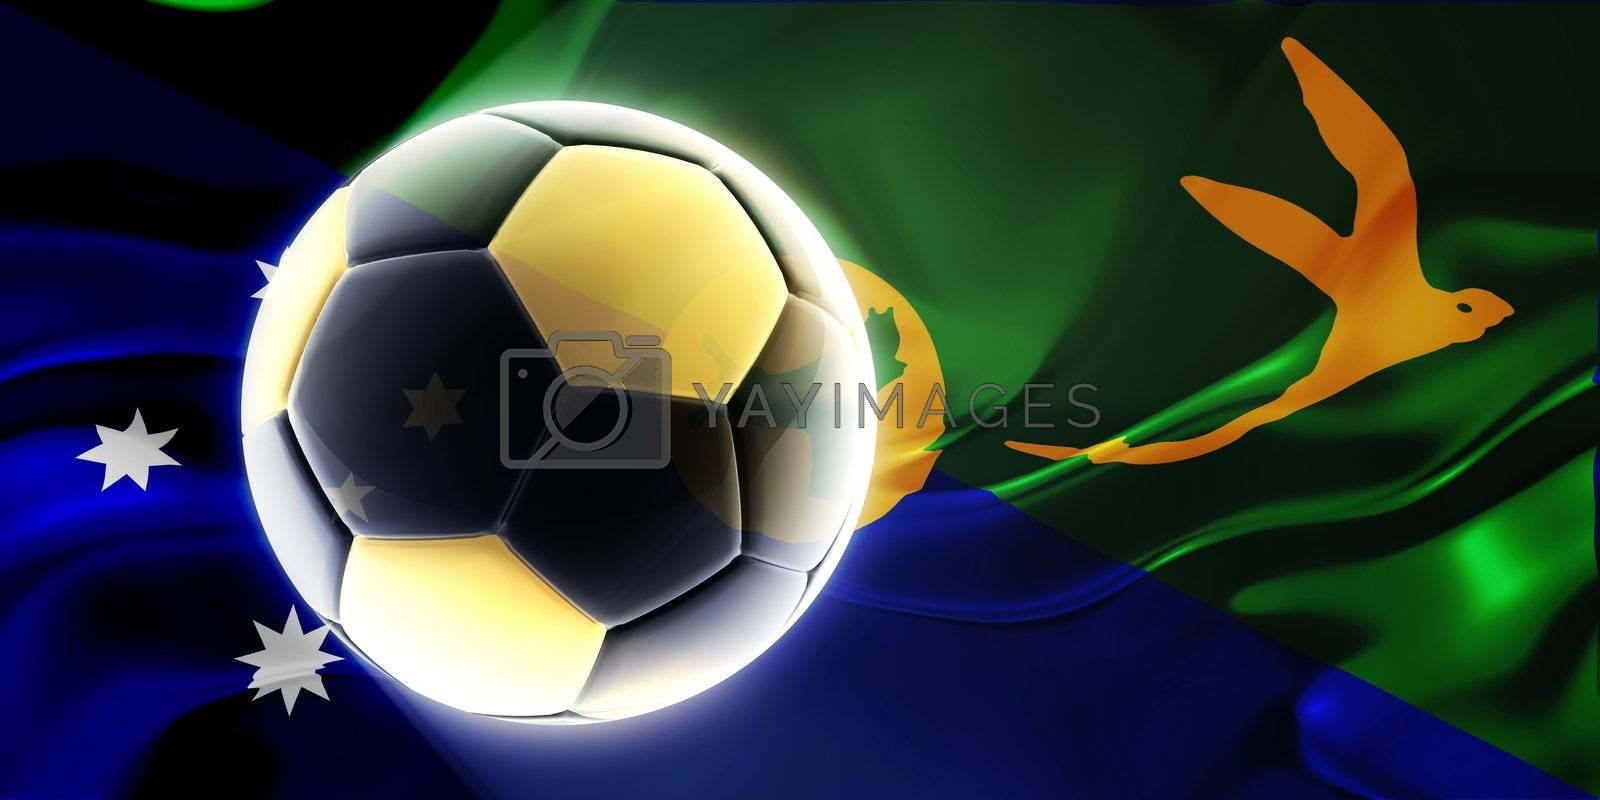 Flag of Christmas Islands, national symbol illustration clipart wavy fabric sports soccer football